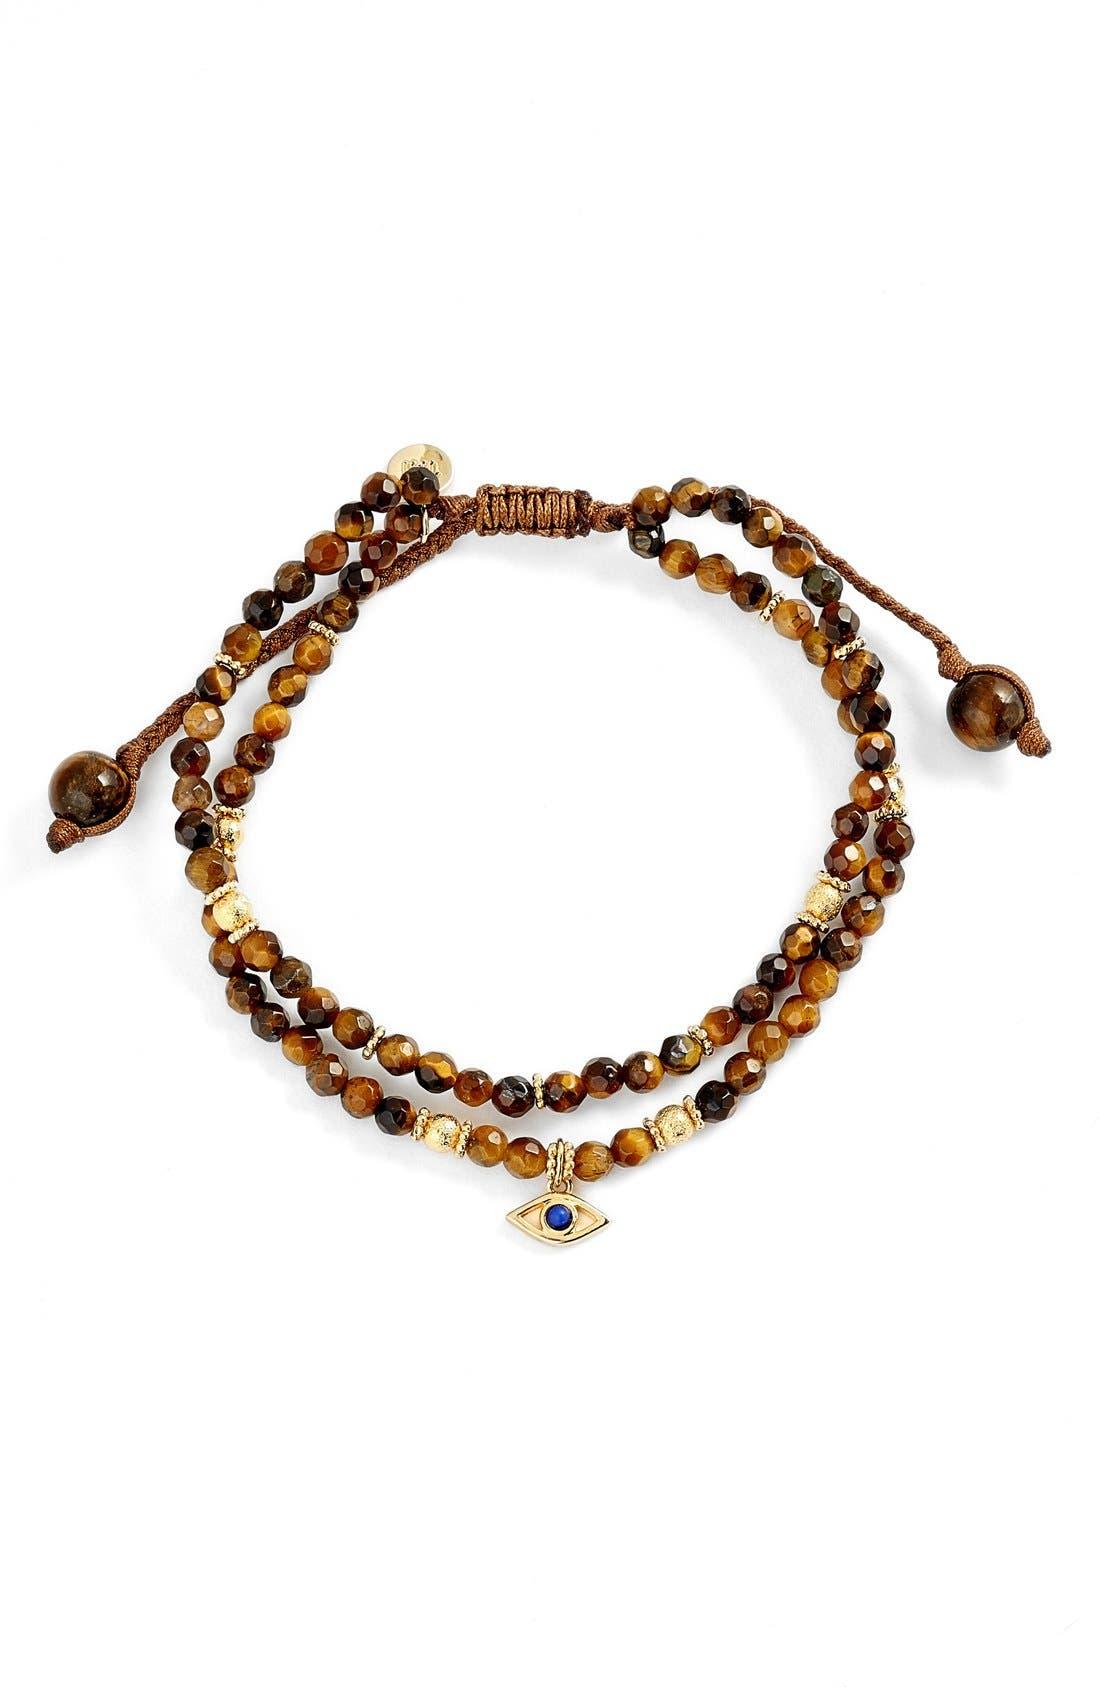 Main Image - Tai Beaded Multistrand Friendship Bracelet